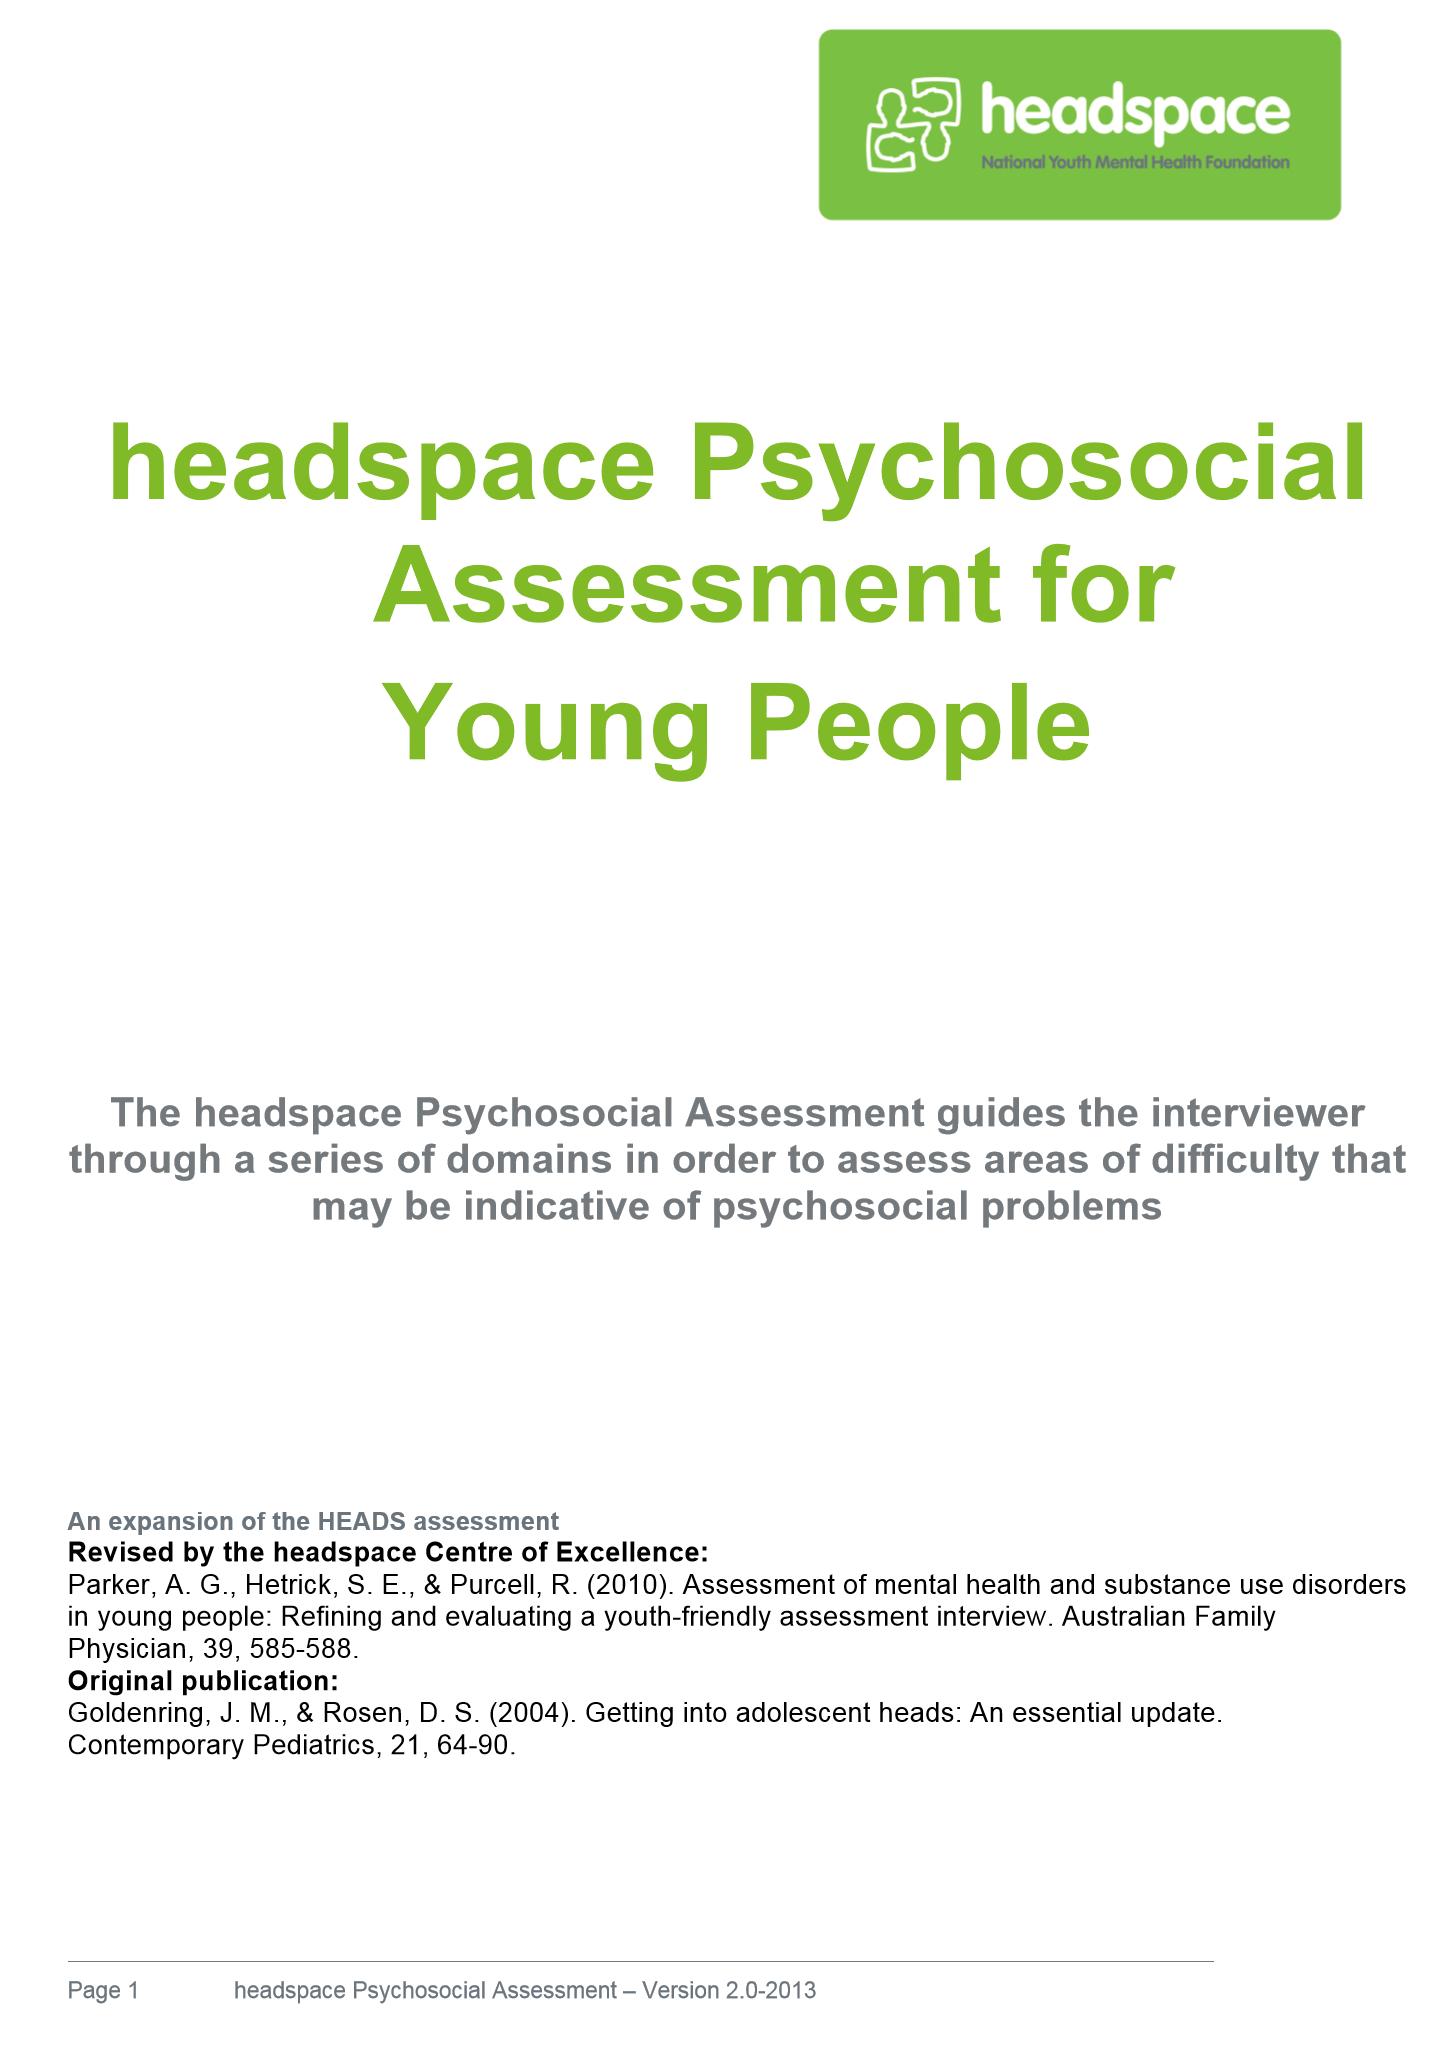 Headss Assessment